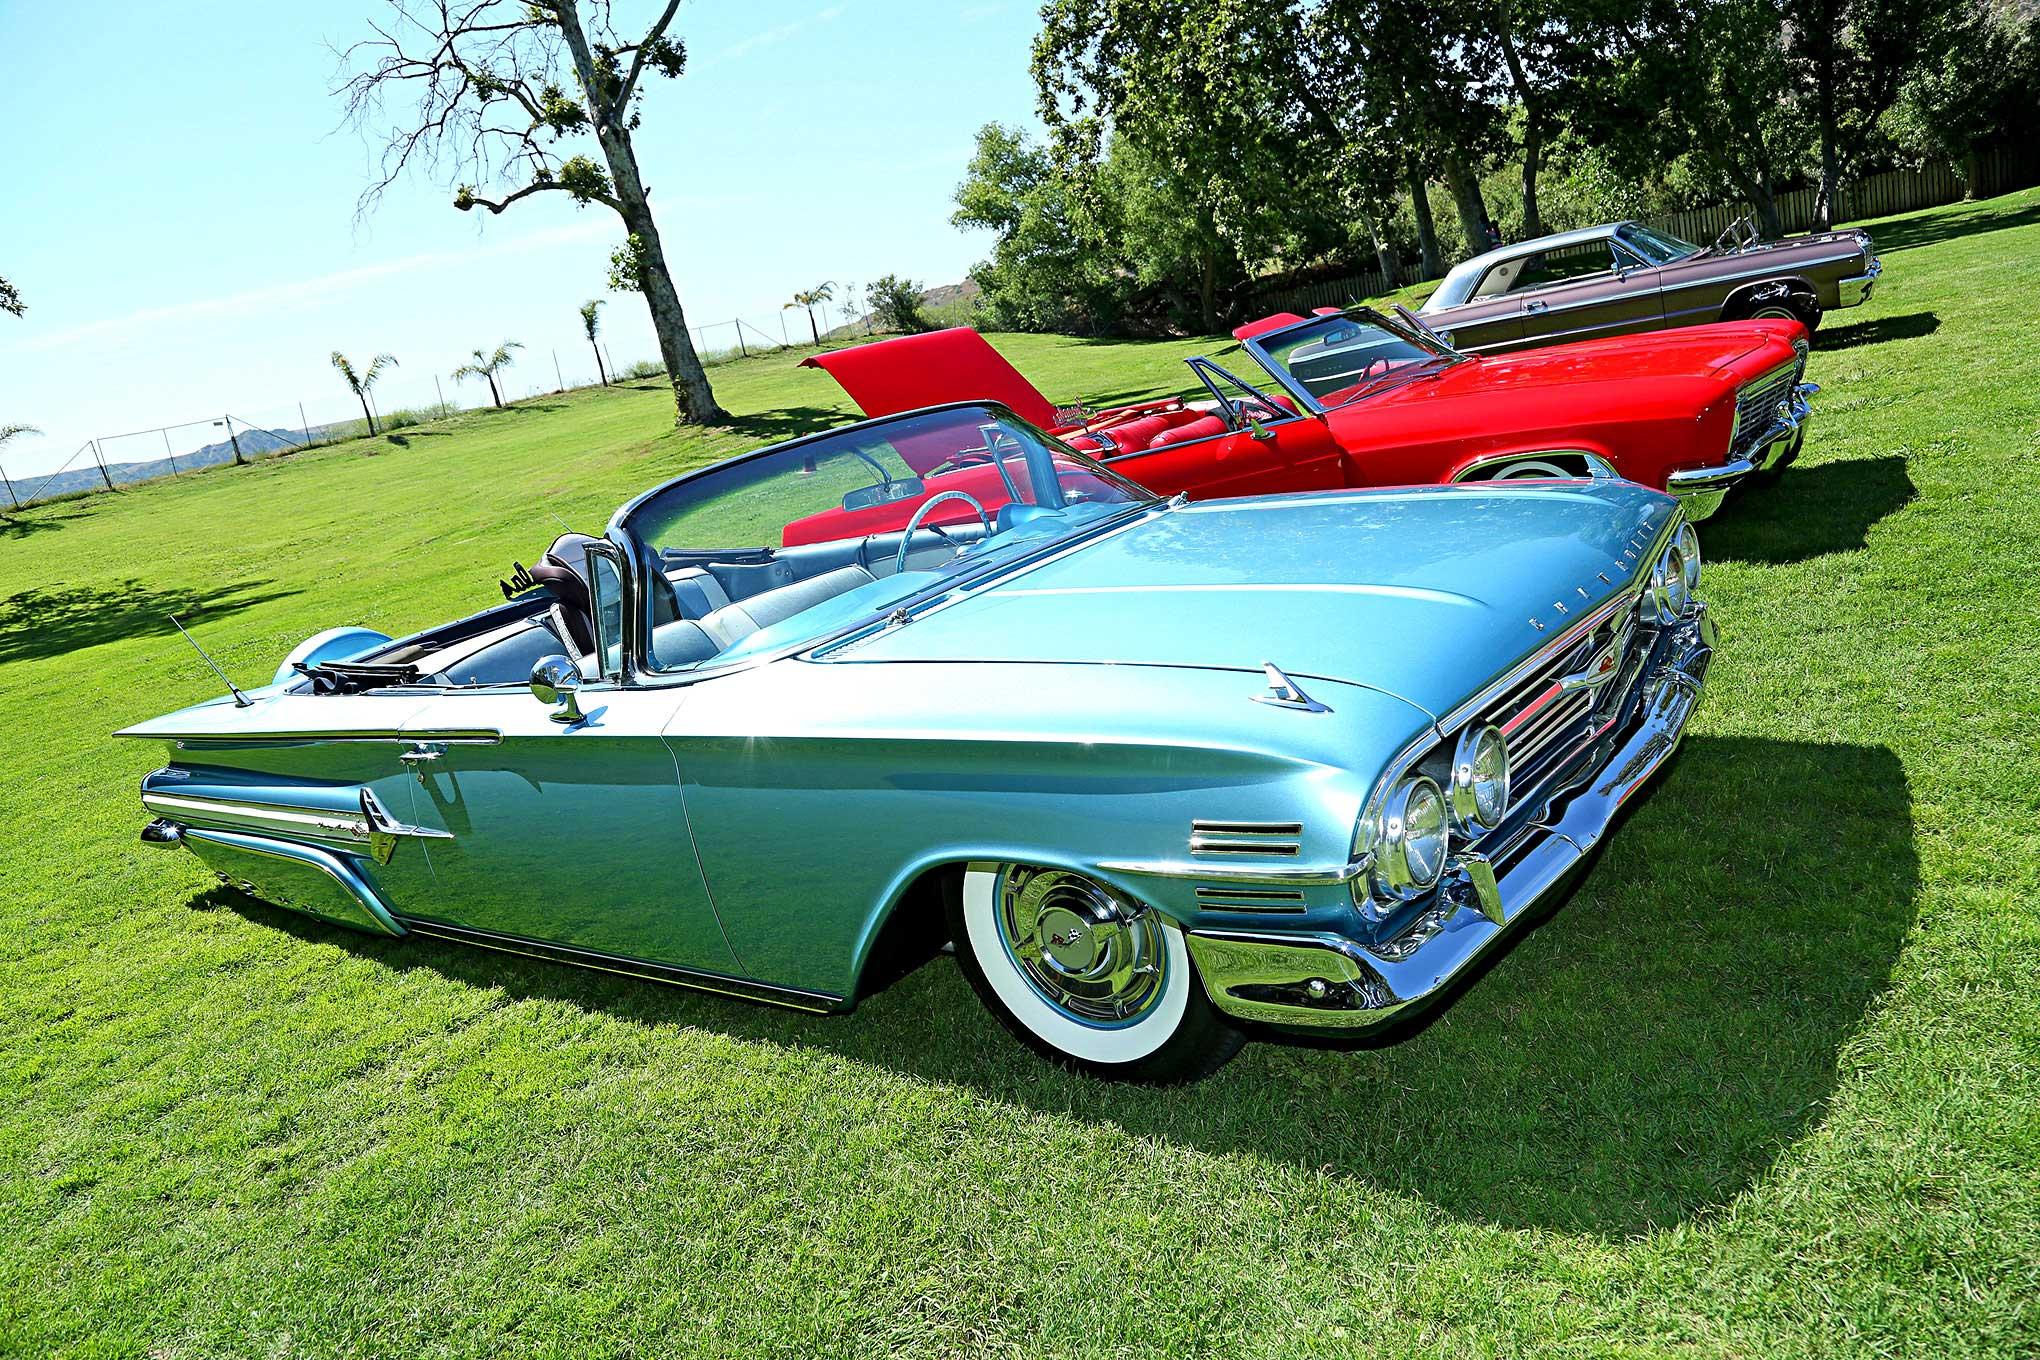 Impalas Car Club OC Chapter 2017 BBQ 1960 Chevy Impala ...